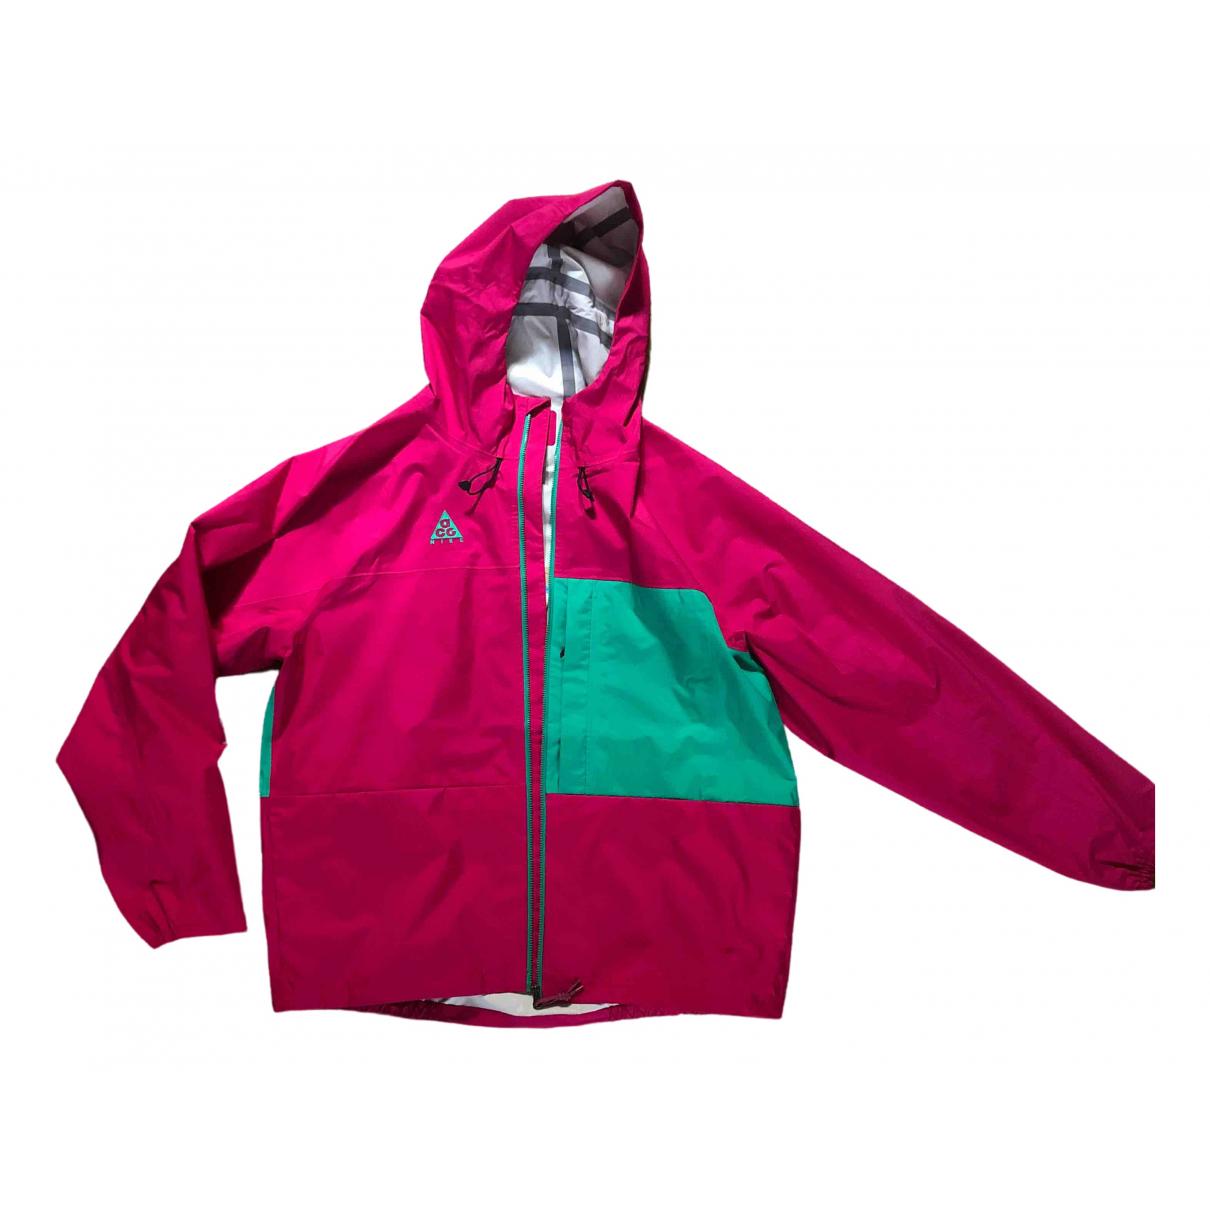 Nike Acg \N Pink jacket for Women M International